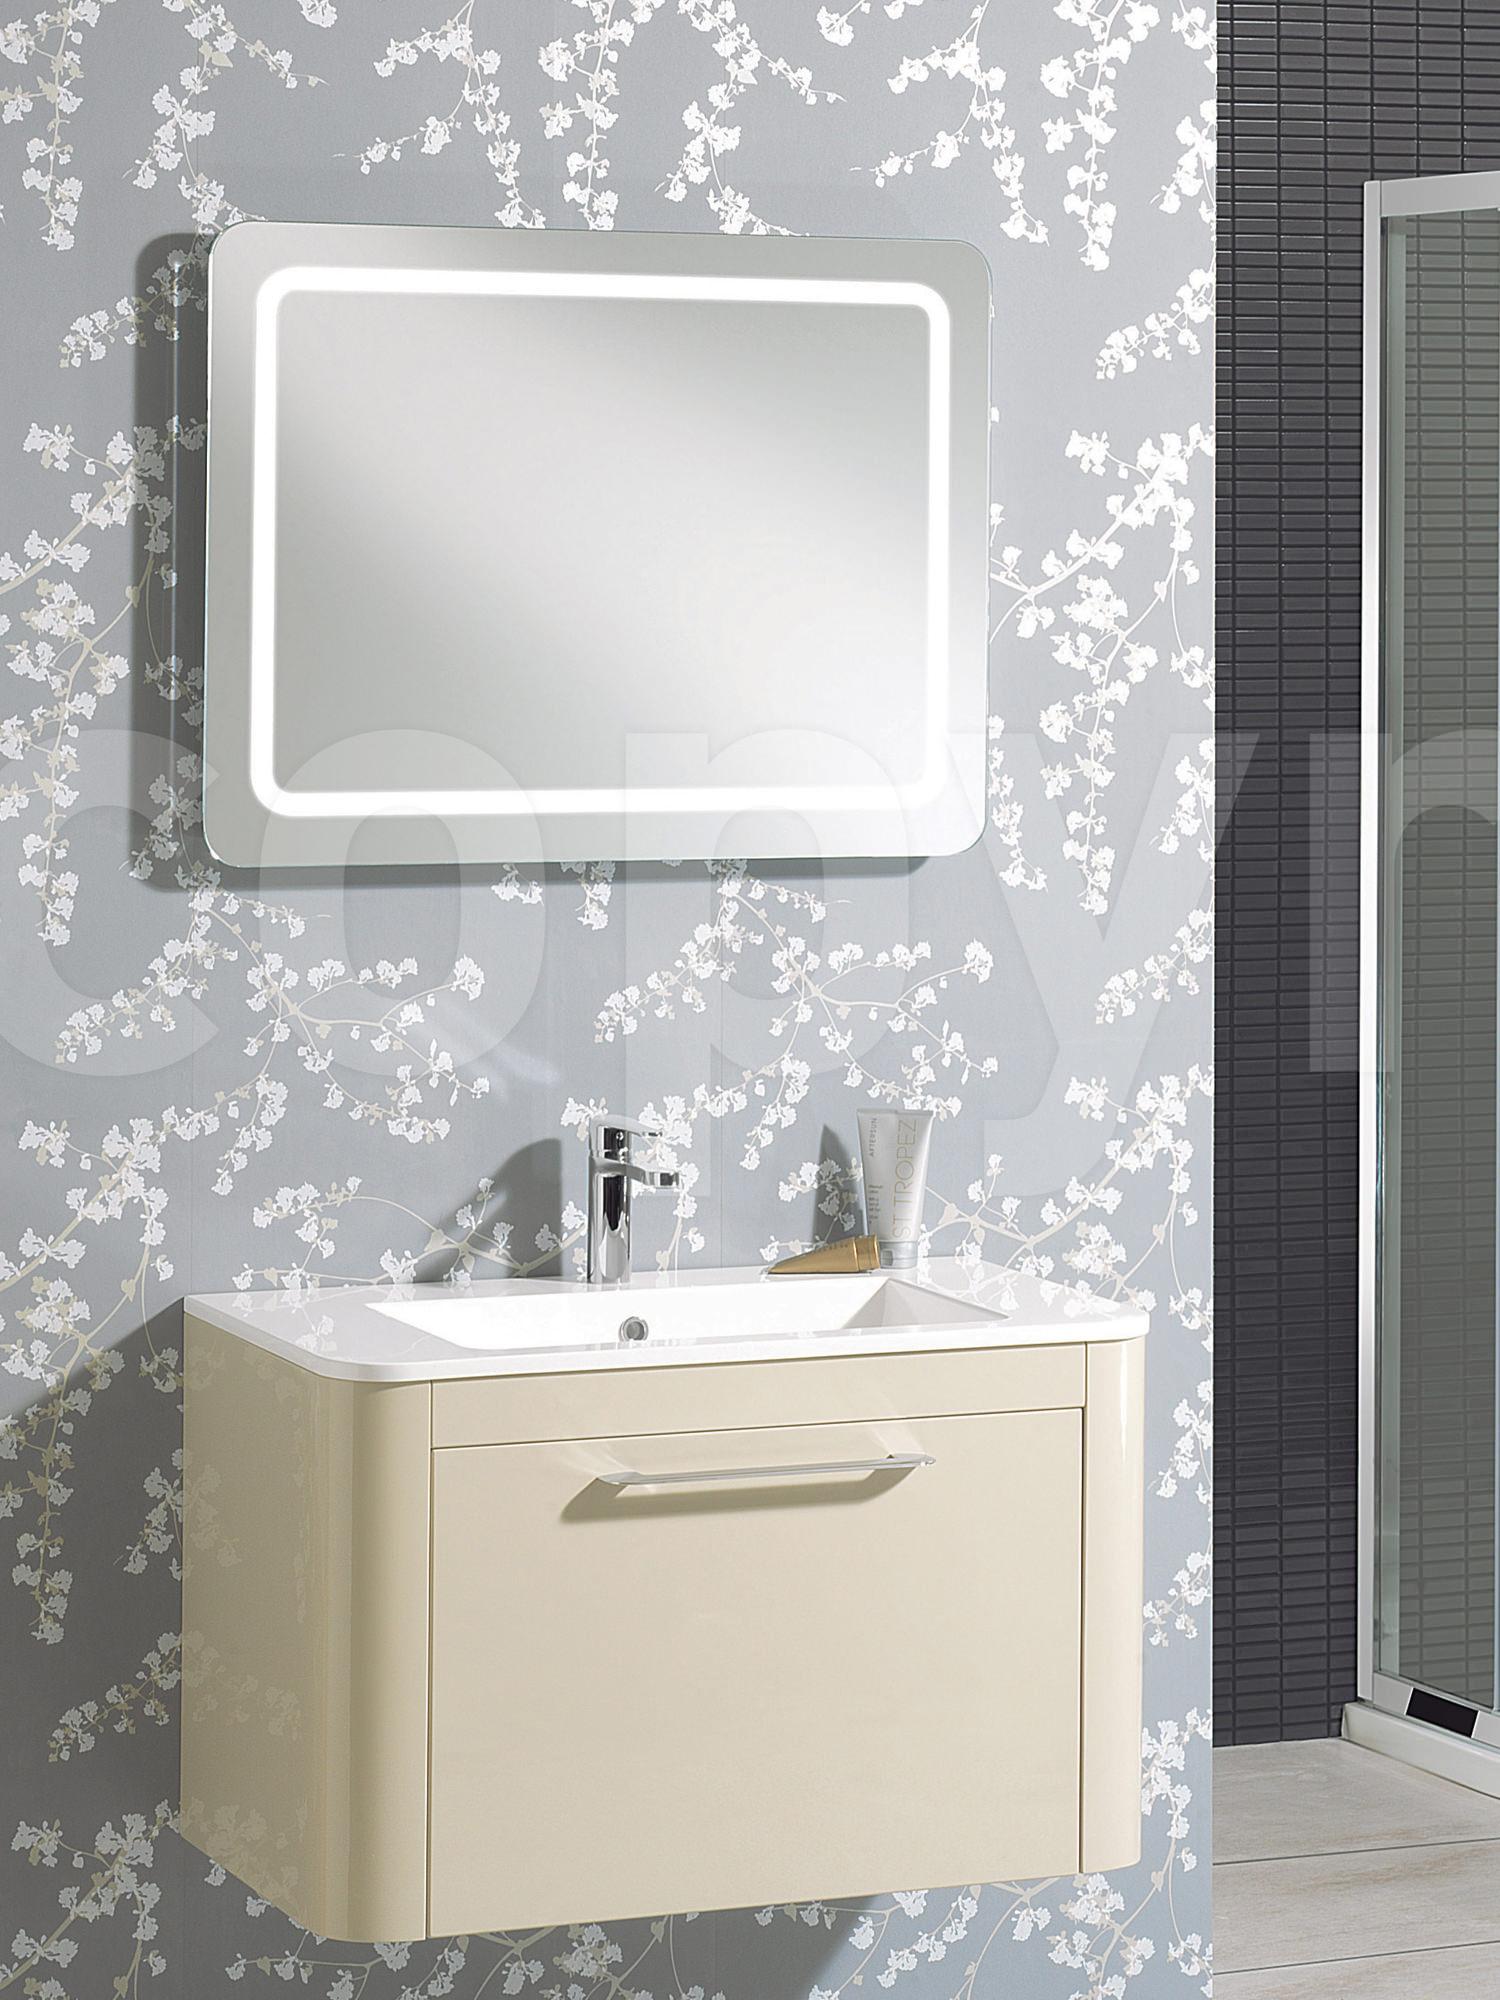 Flat Pack Kitchens >> Bauhaus Celeste Back Lit Mirror 600 X 800MM With Deimister Pad - MF8060B+